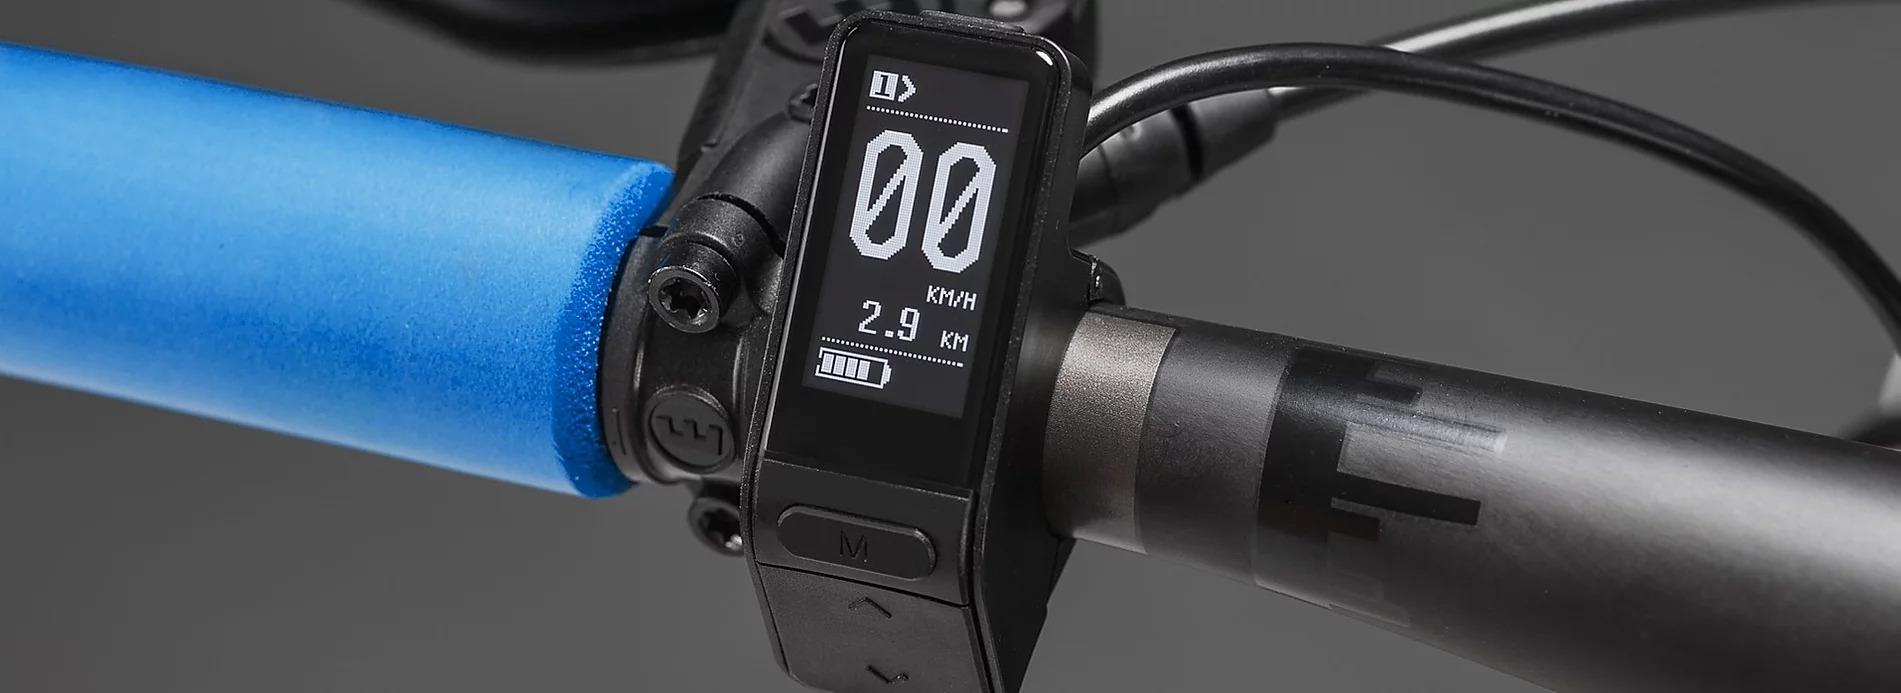 Controll-Display an einem Ben-E-Bike Kinderrad - Jugendrad